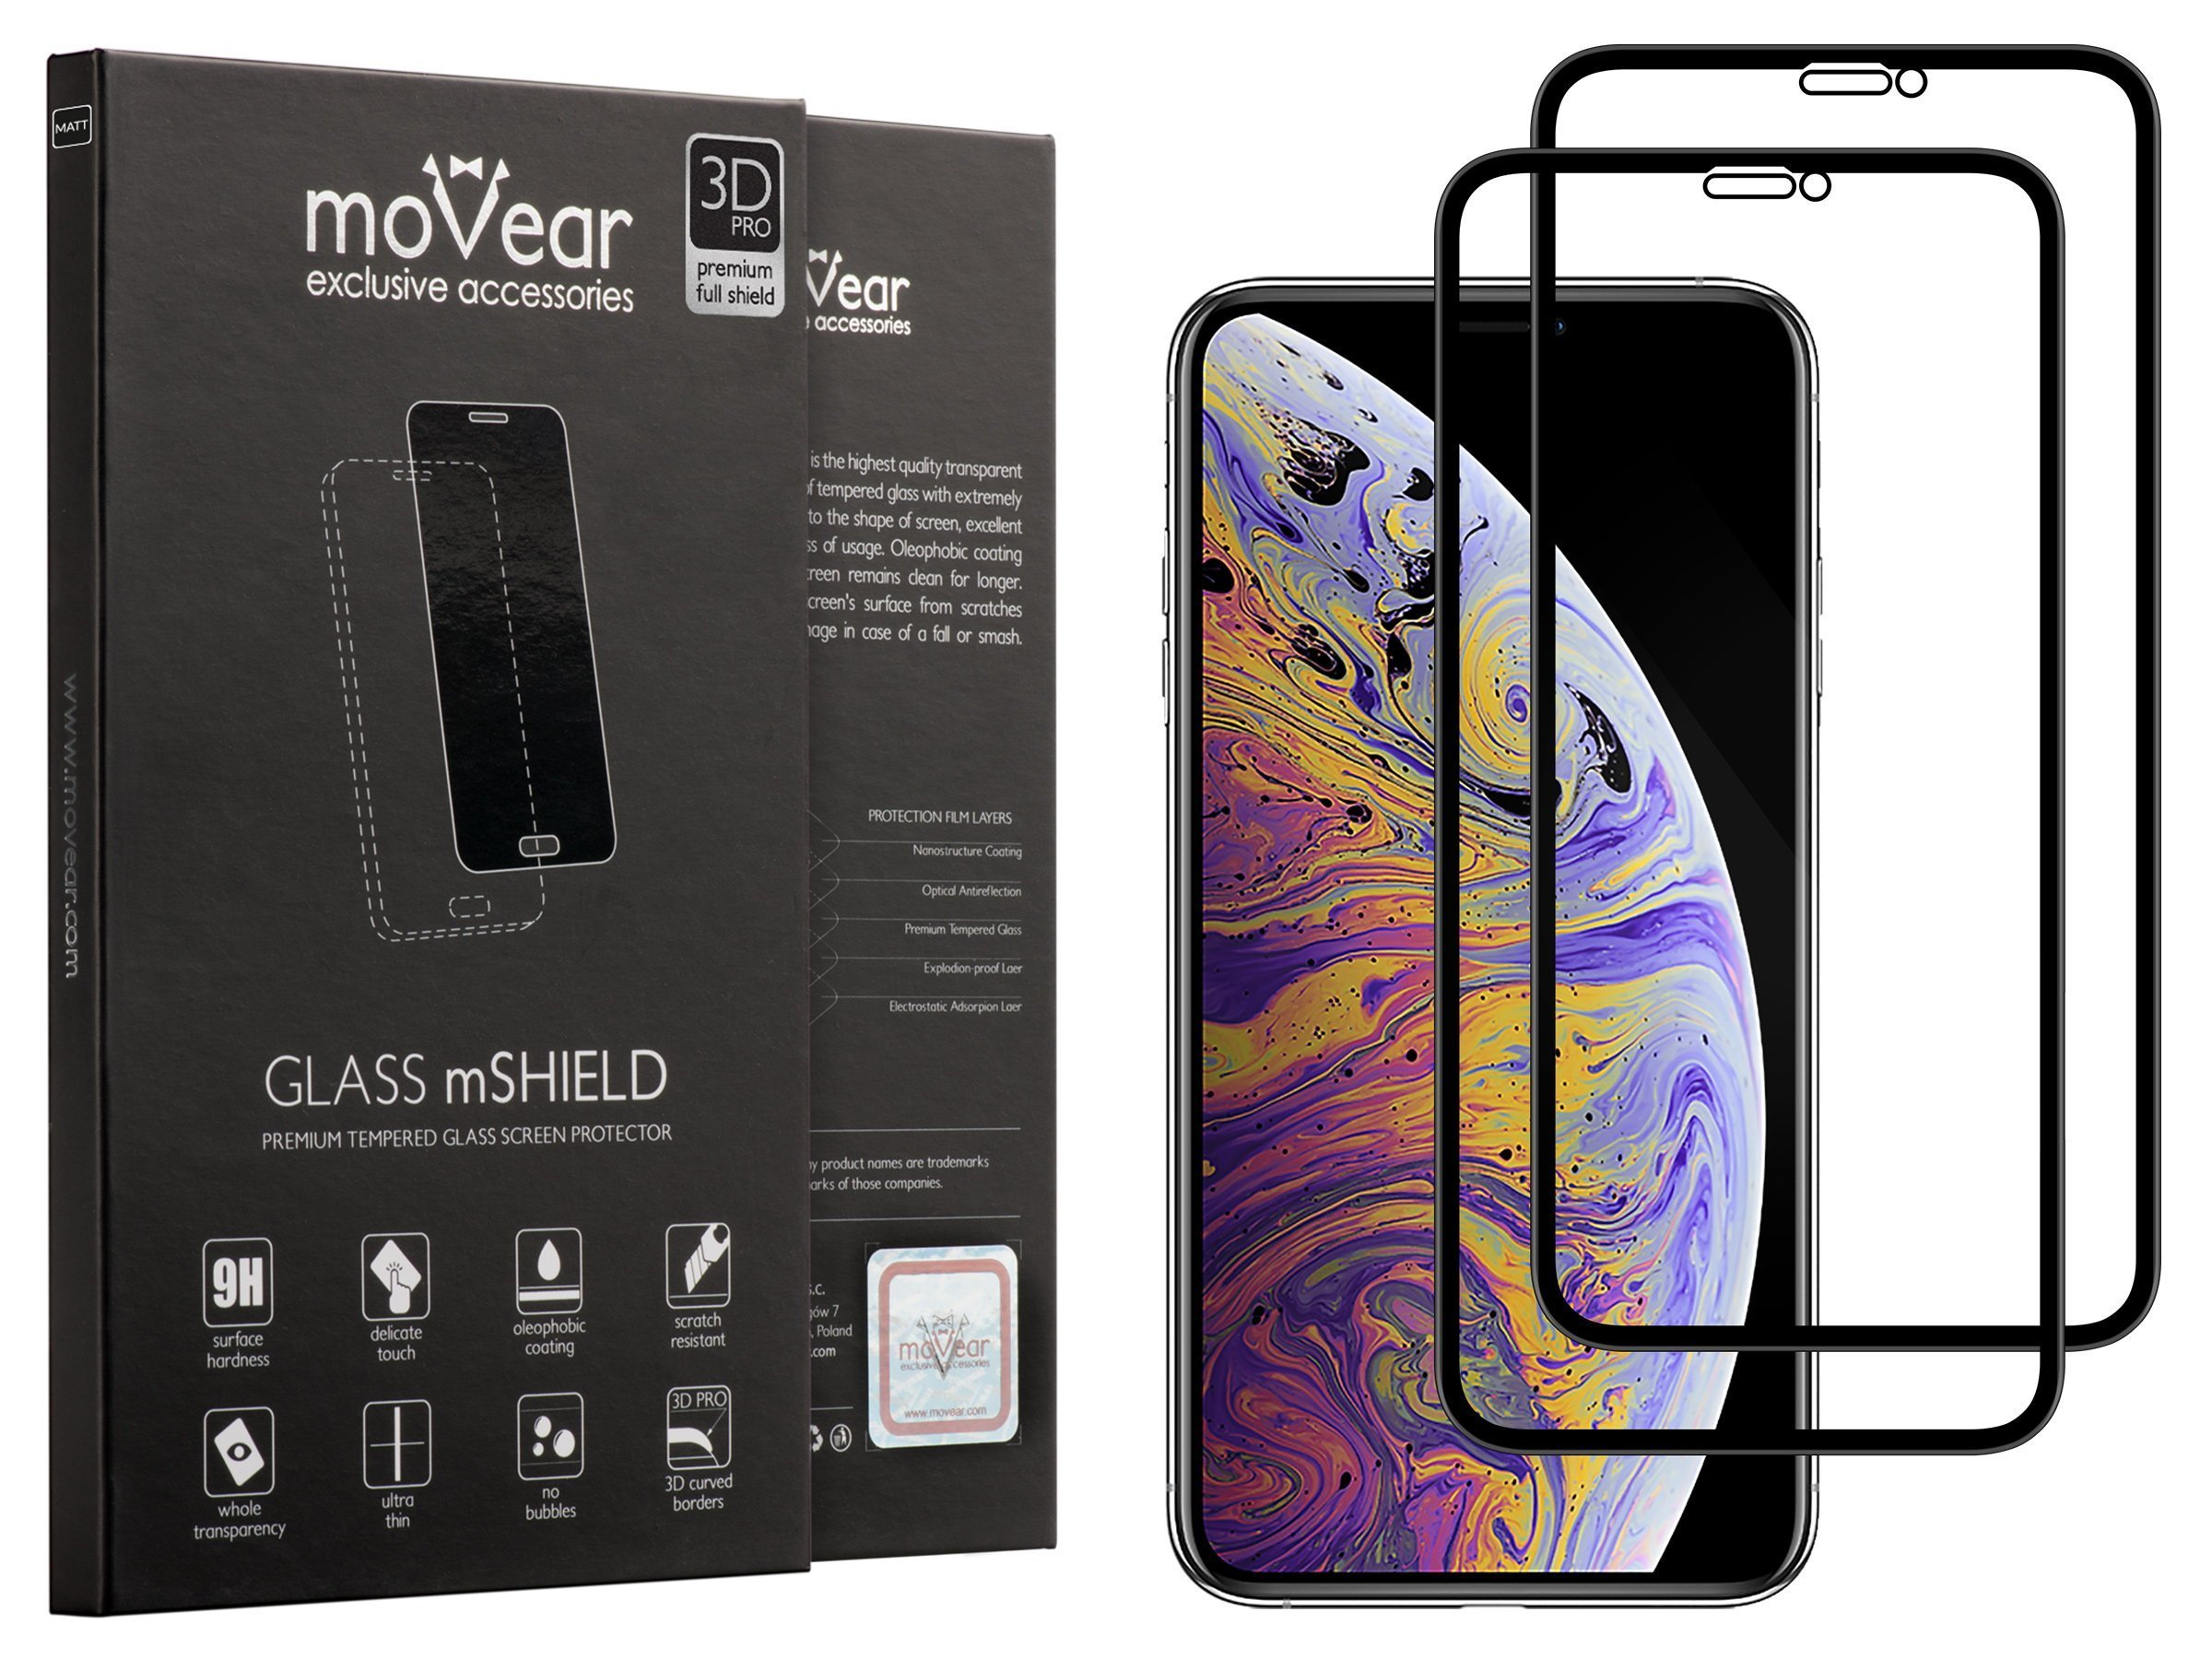 2 szt. | moVear Matowe Szkło Hartowane 3D PRO MATT na Apple iPhone Xs MAX | na Cały Ekran, Antyrefleksyjne, 9H | GLASS mSHIELD Czarny